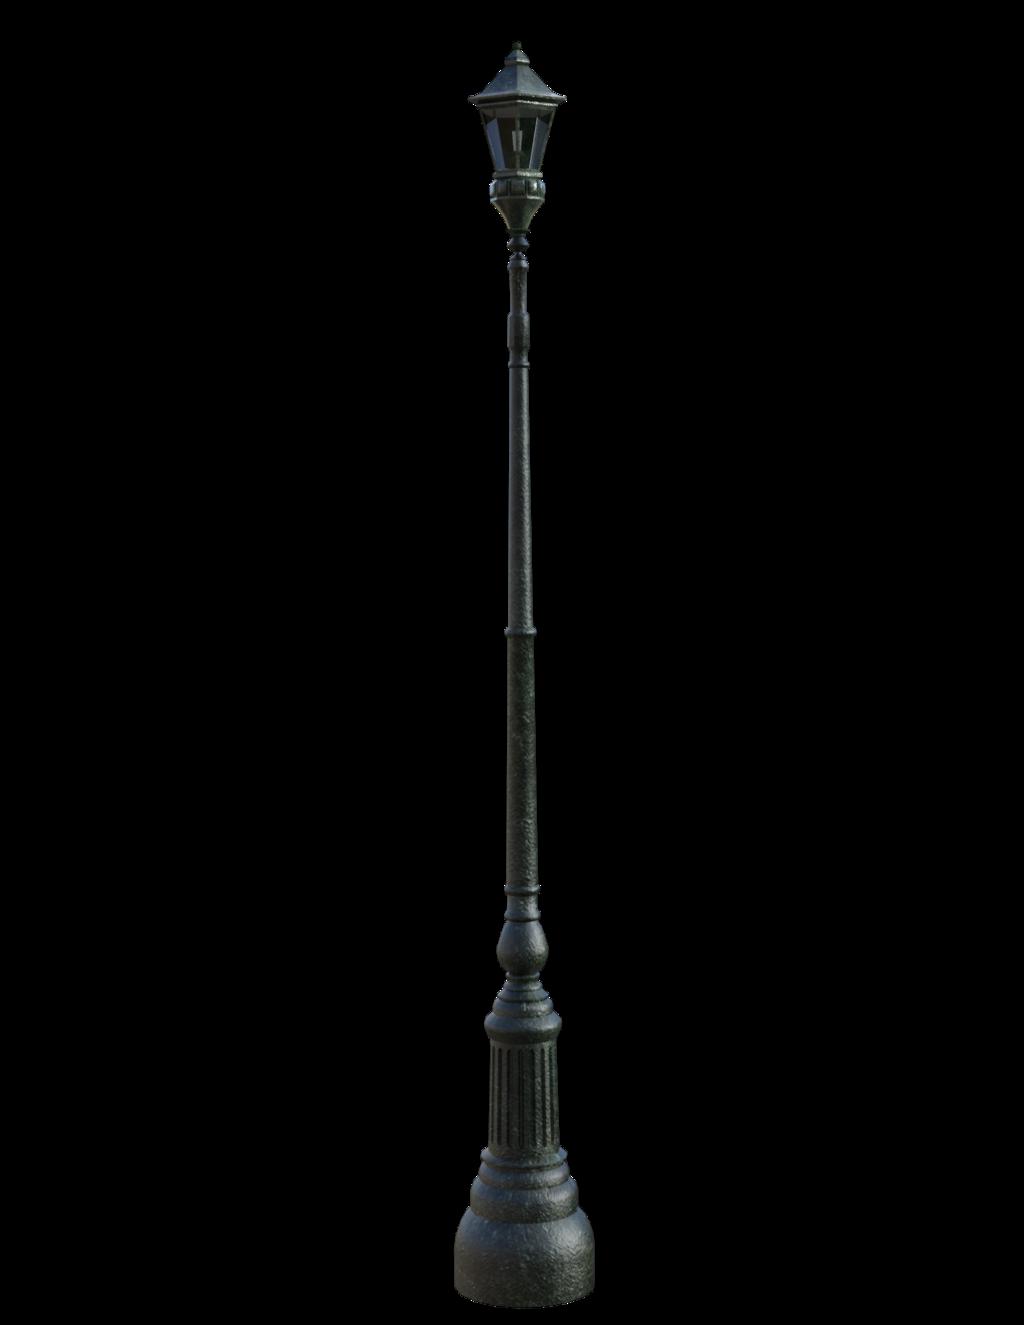 Pin By Santanu Singh On Render Stuff Victorian Street Street Light Street Lamp